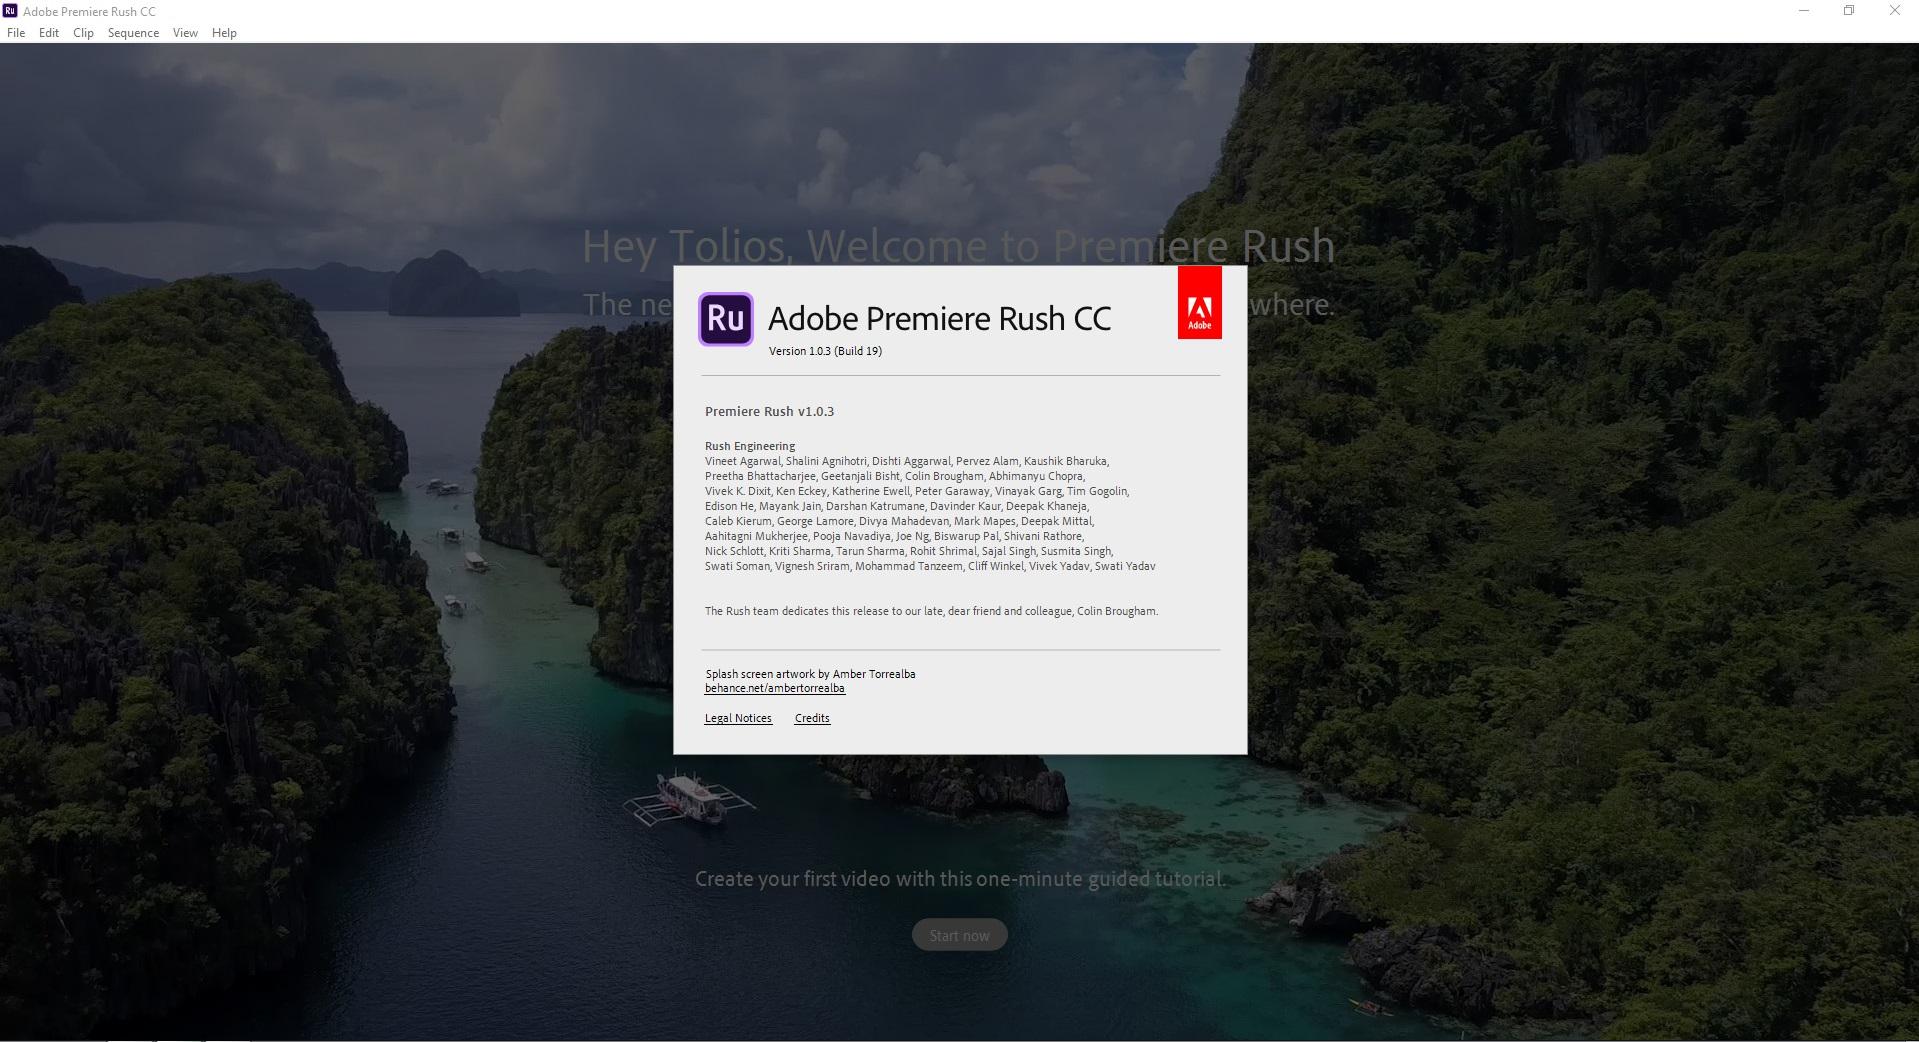 Adobe Premiere Rush CC (v1.0.3) Multilingüe